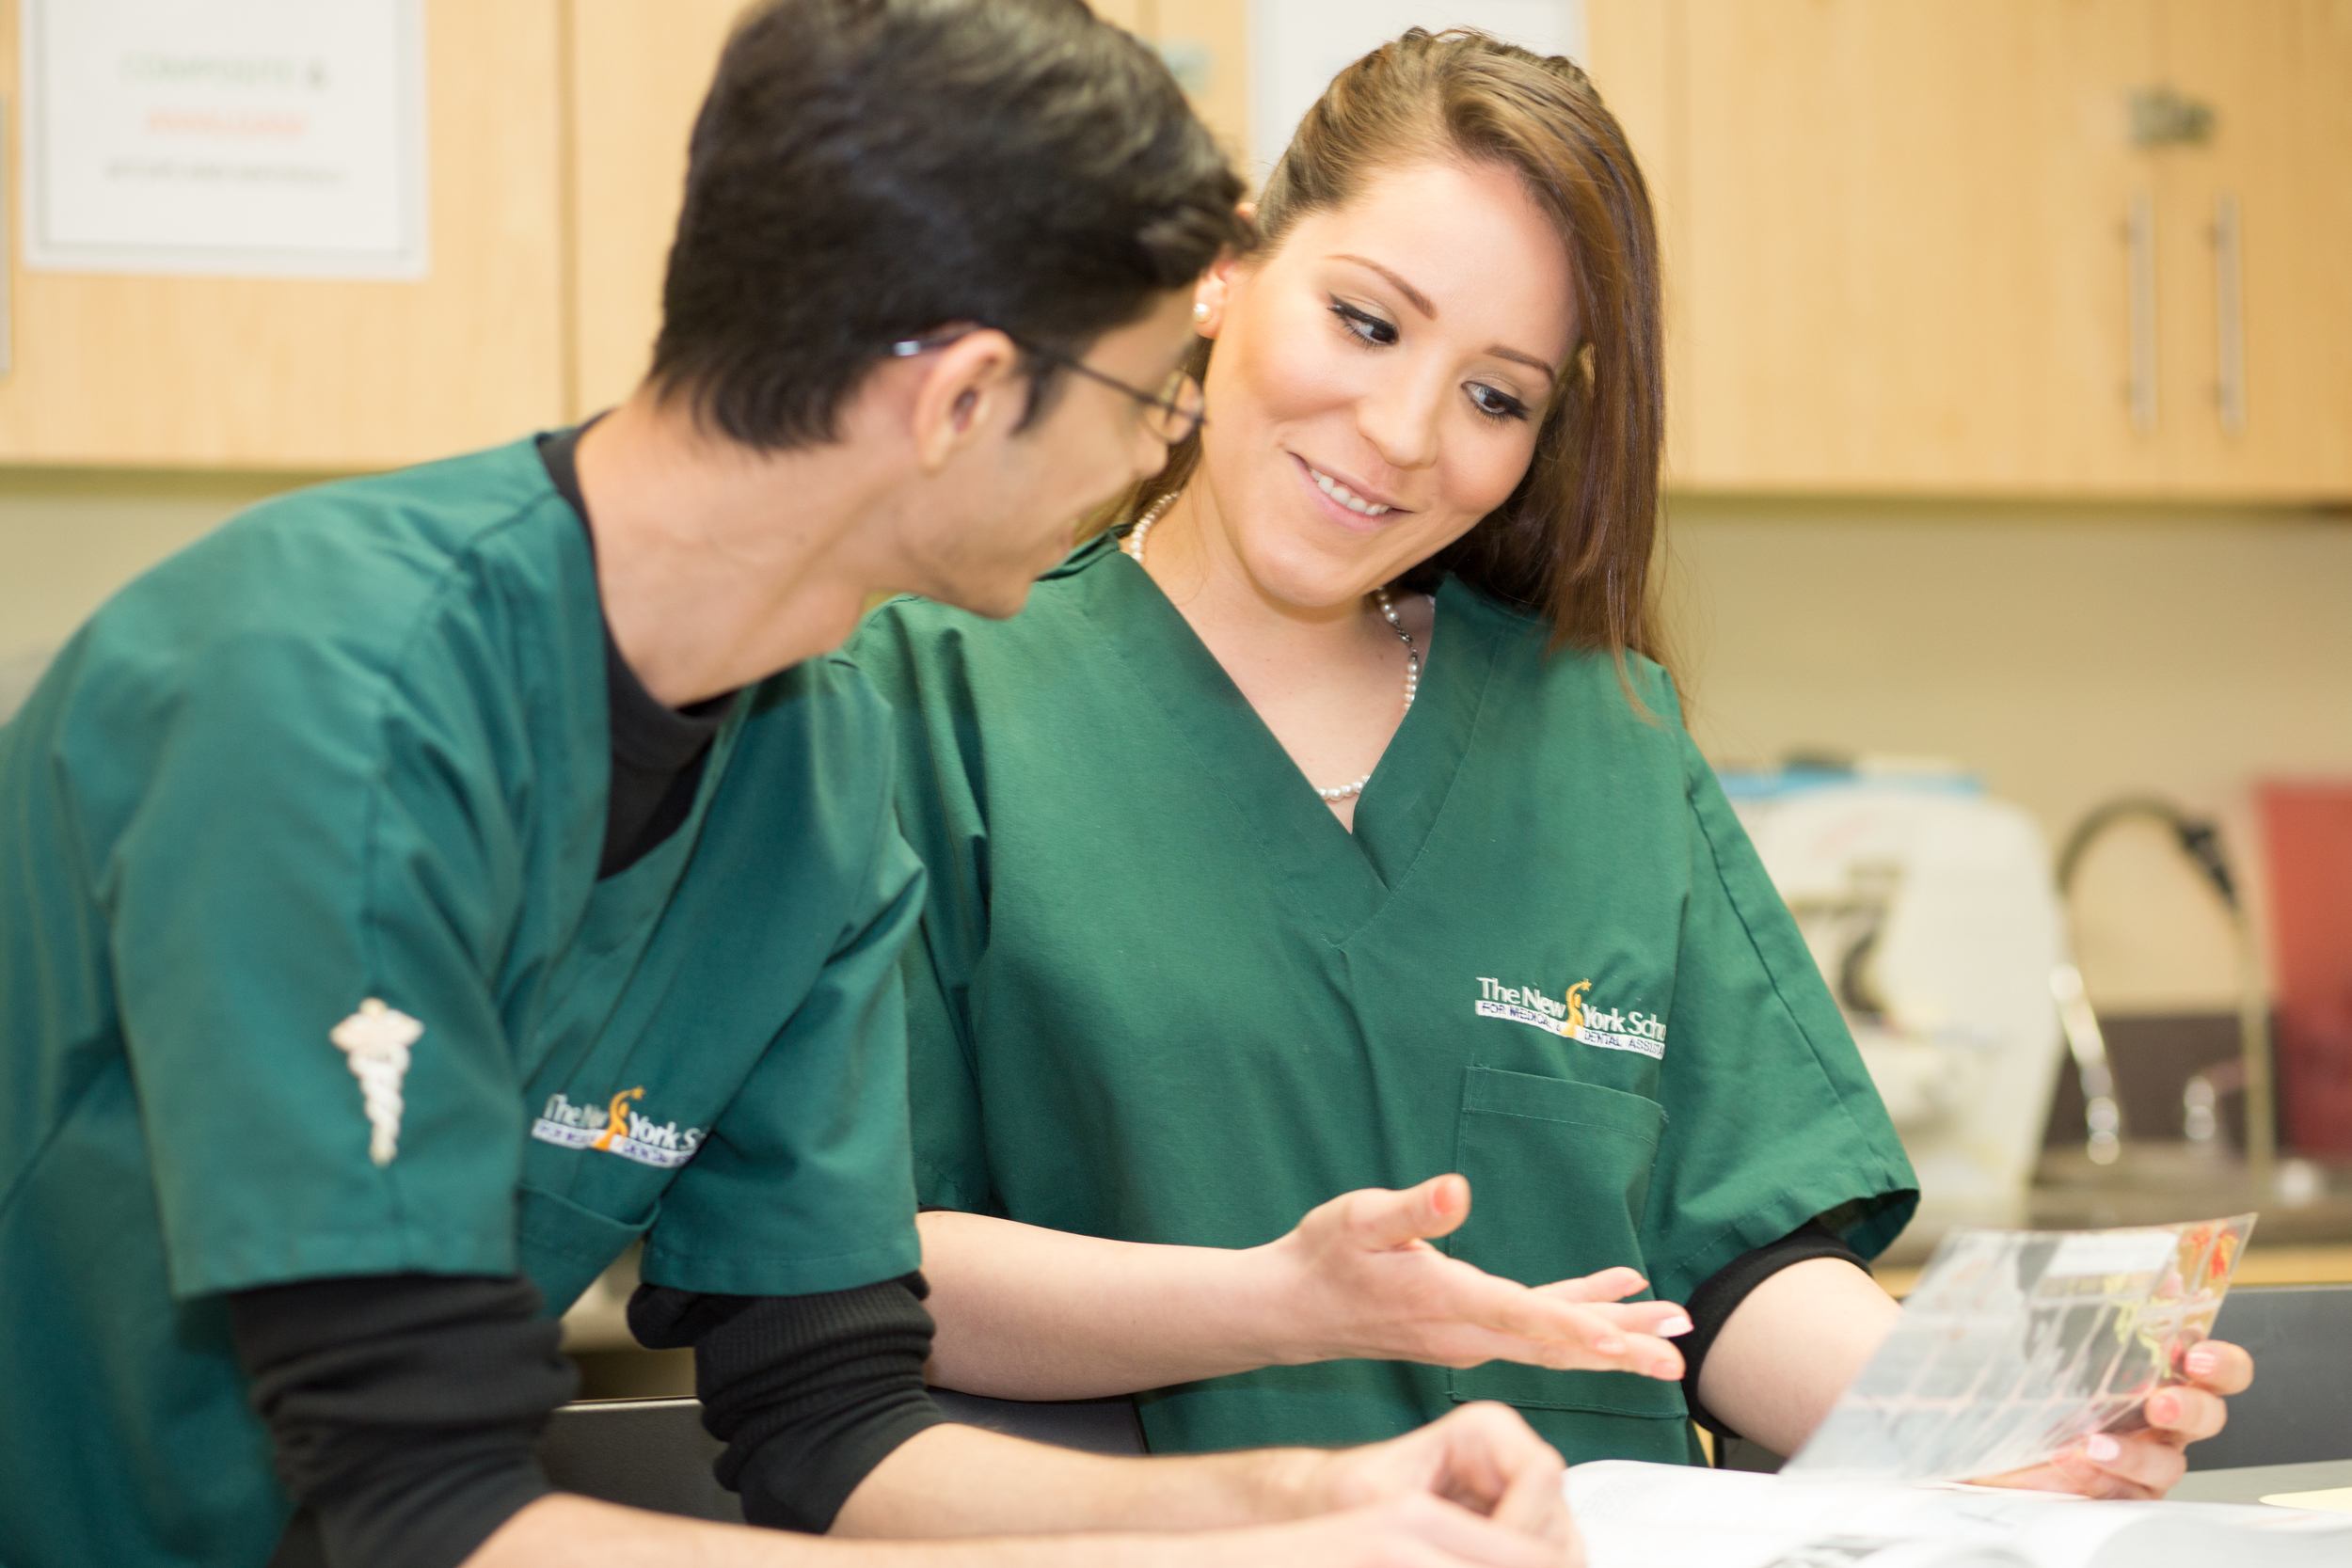 NYSMDA Dental Assistant Students working together